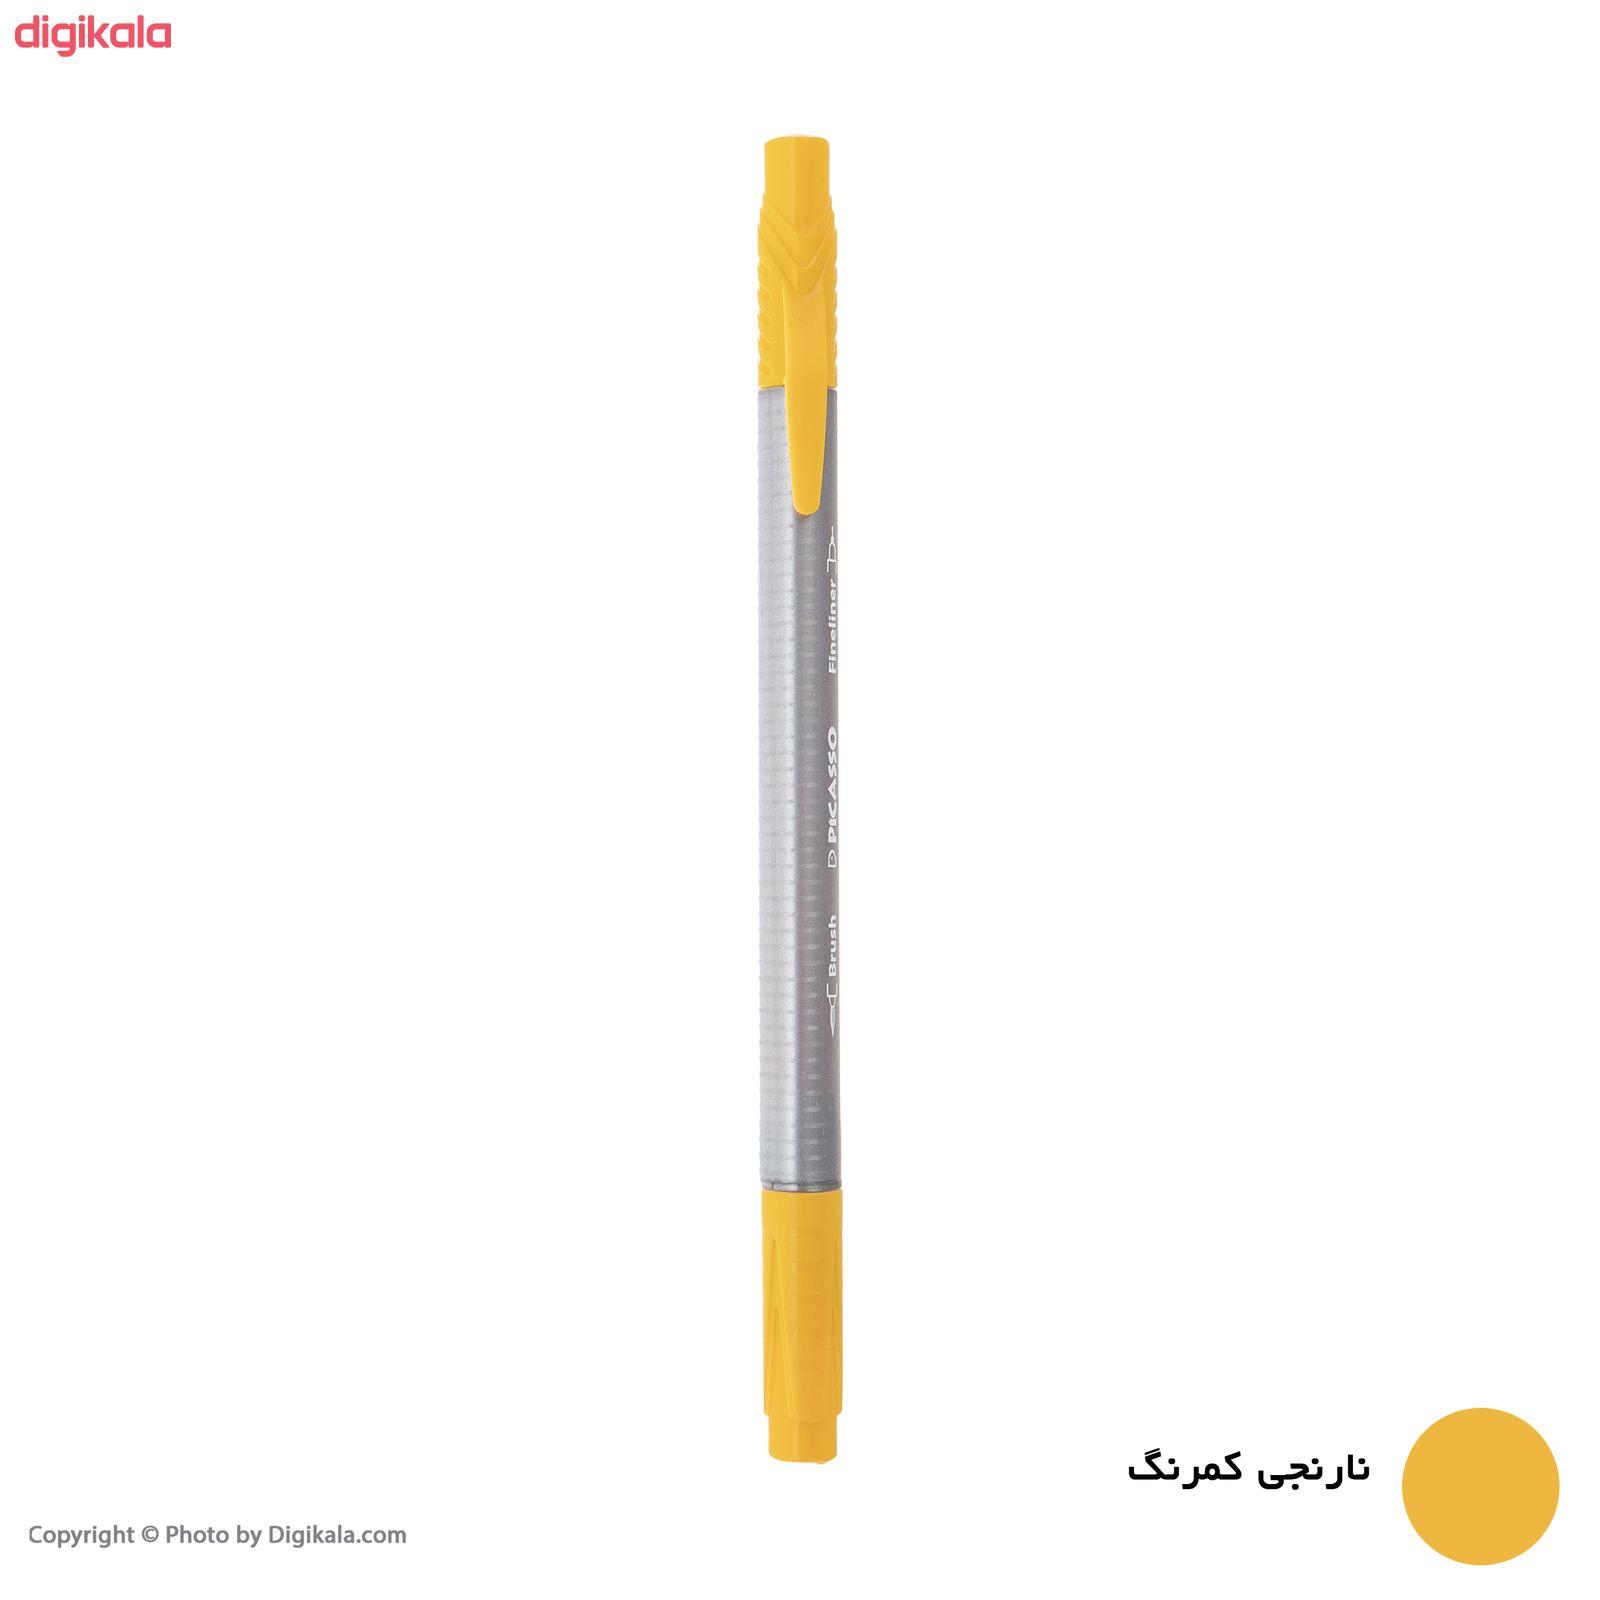 روان نویس پیکاسو مدل Brush Marker Fine Liner main 1 15